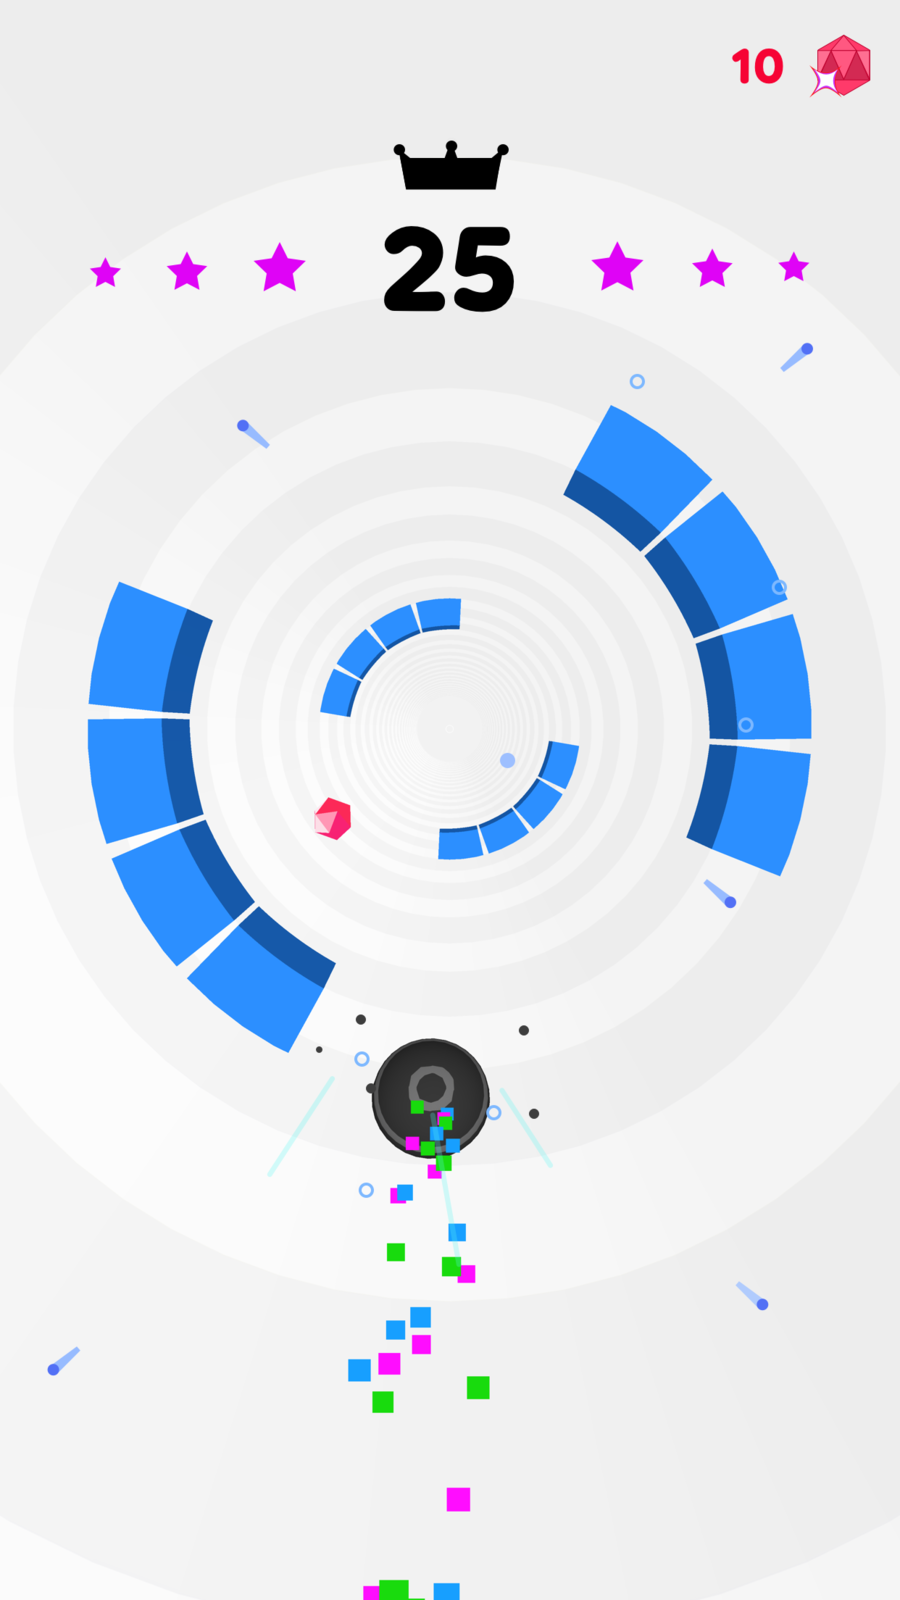 Vortex mod apk free subscription | Vortex Cloud Gaming Mod APK Free